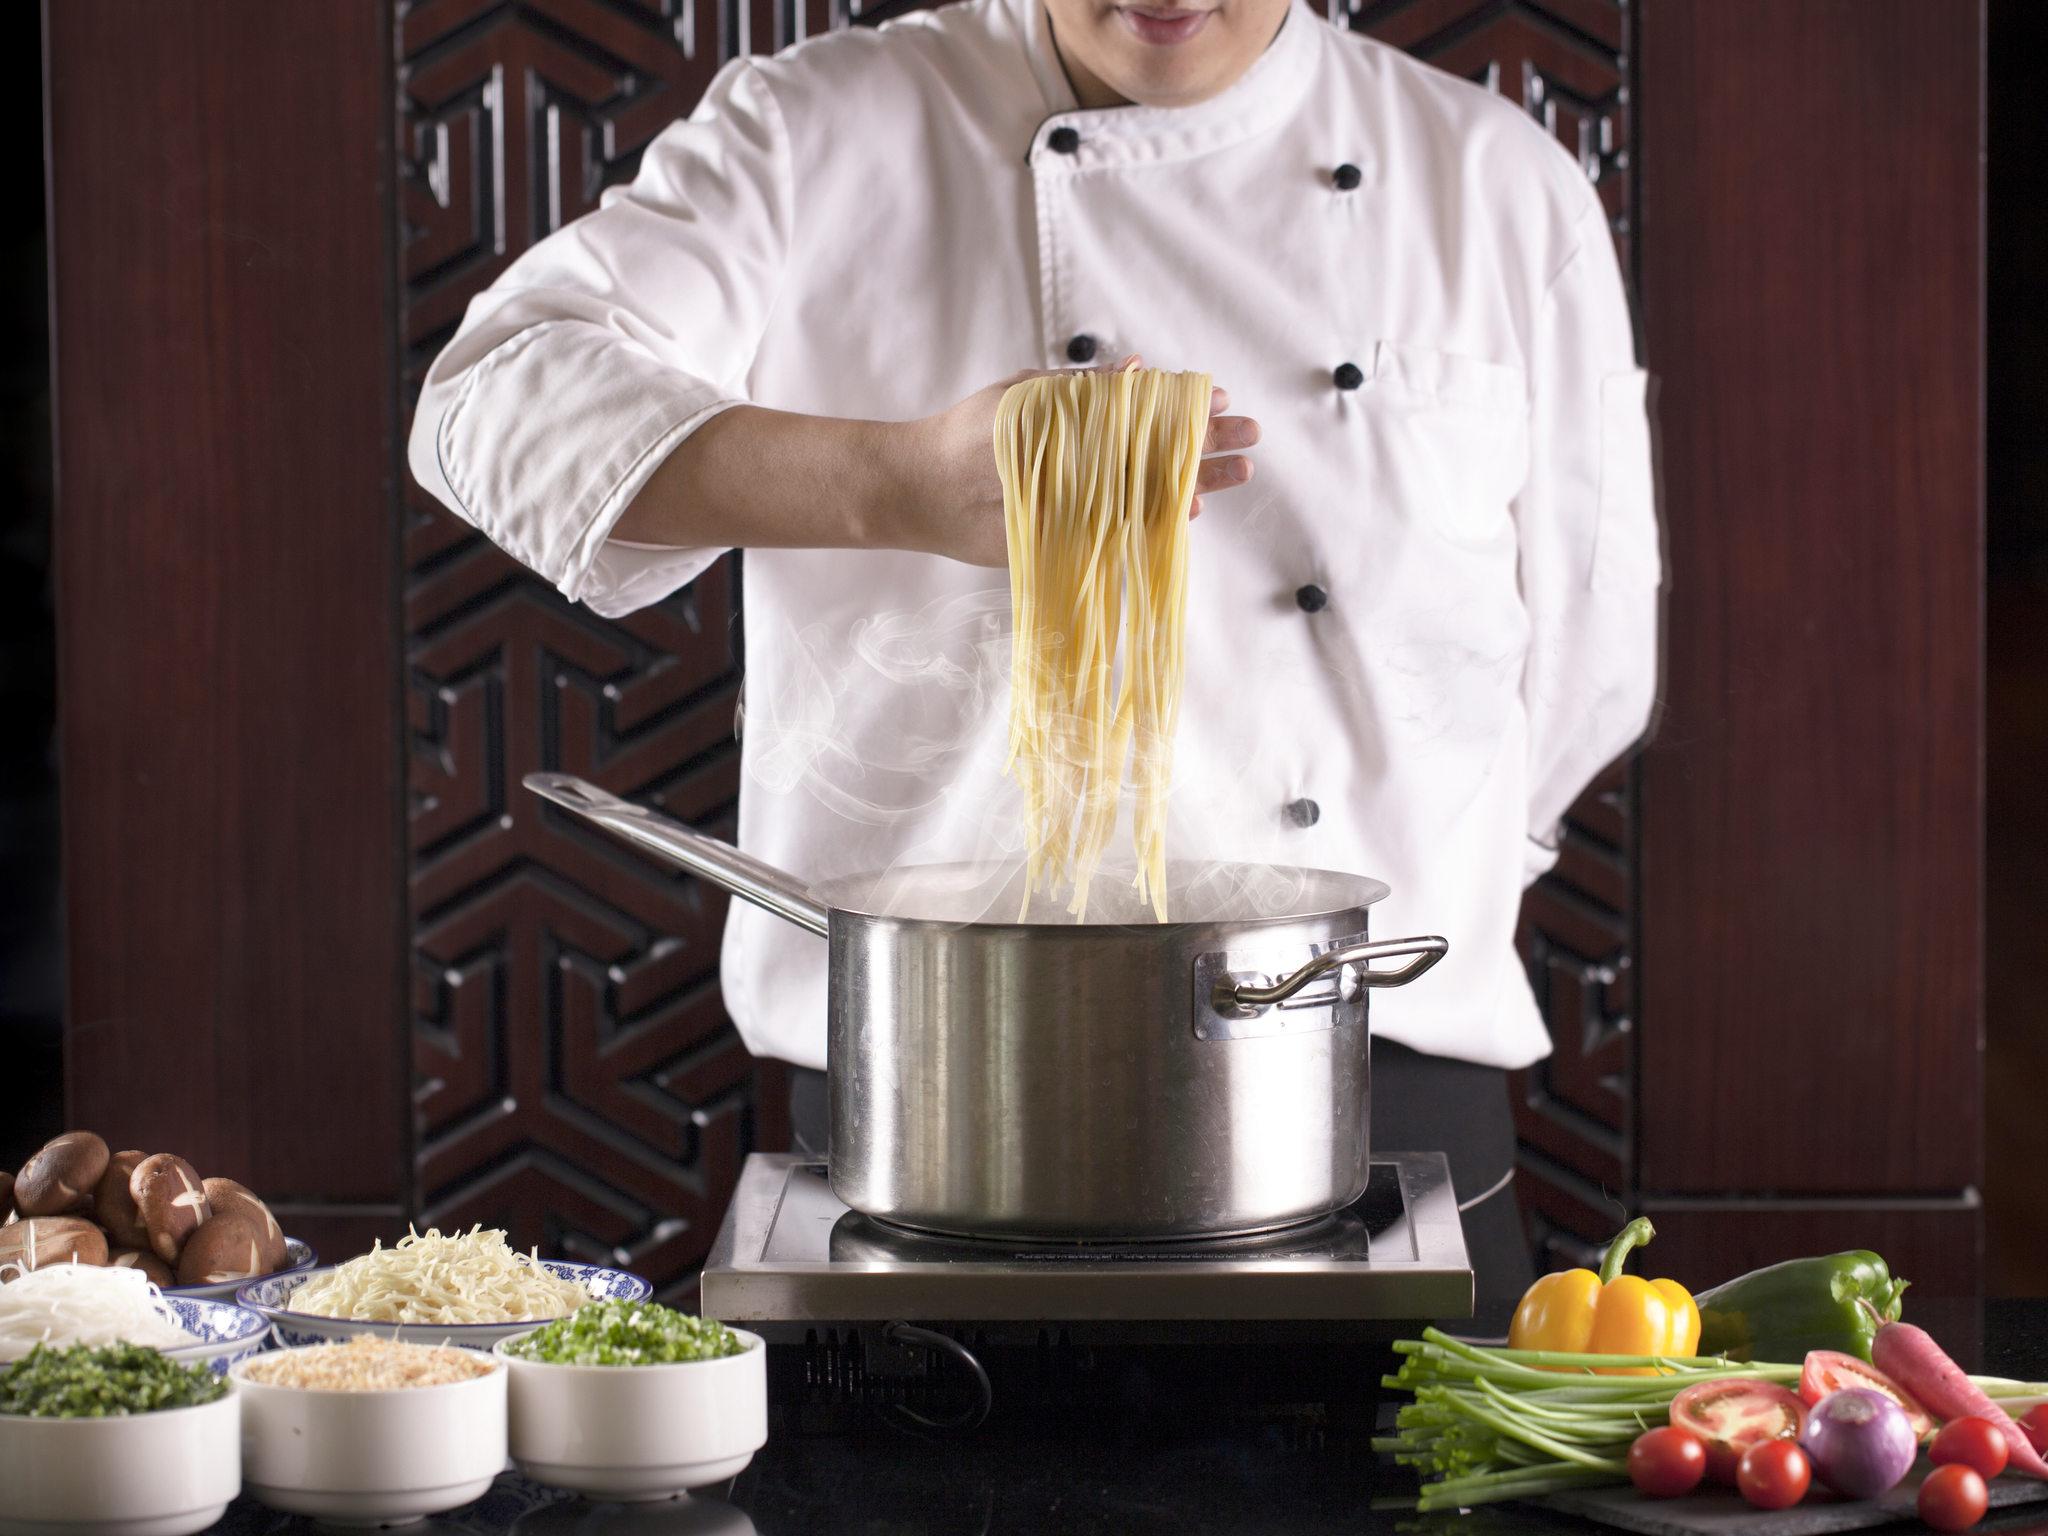 Hotel In Beijing Grand Mercure Dongcheng Special Deal 4 Days Dept 11 Aug 18 Restaurant